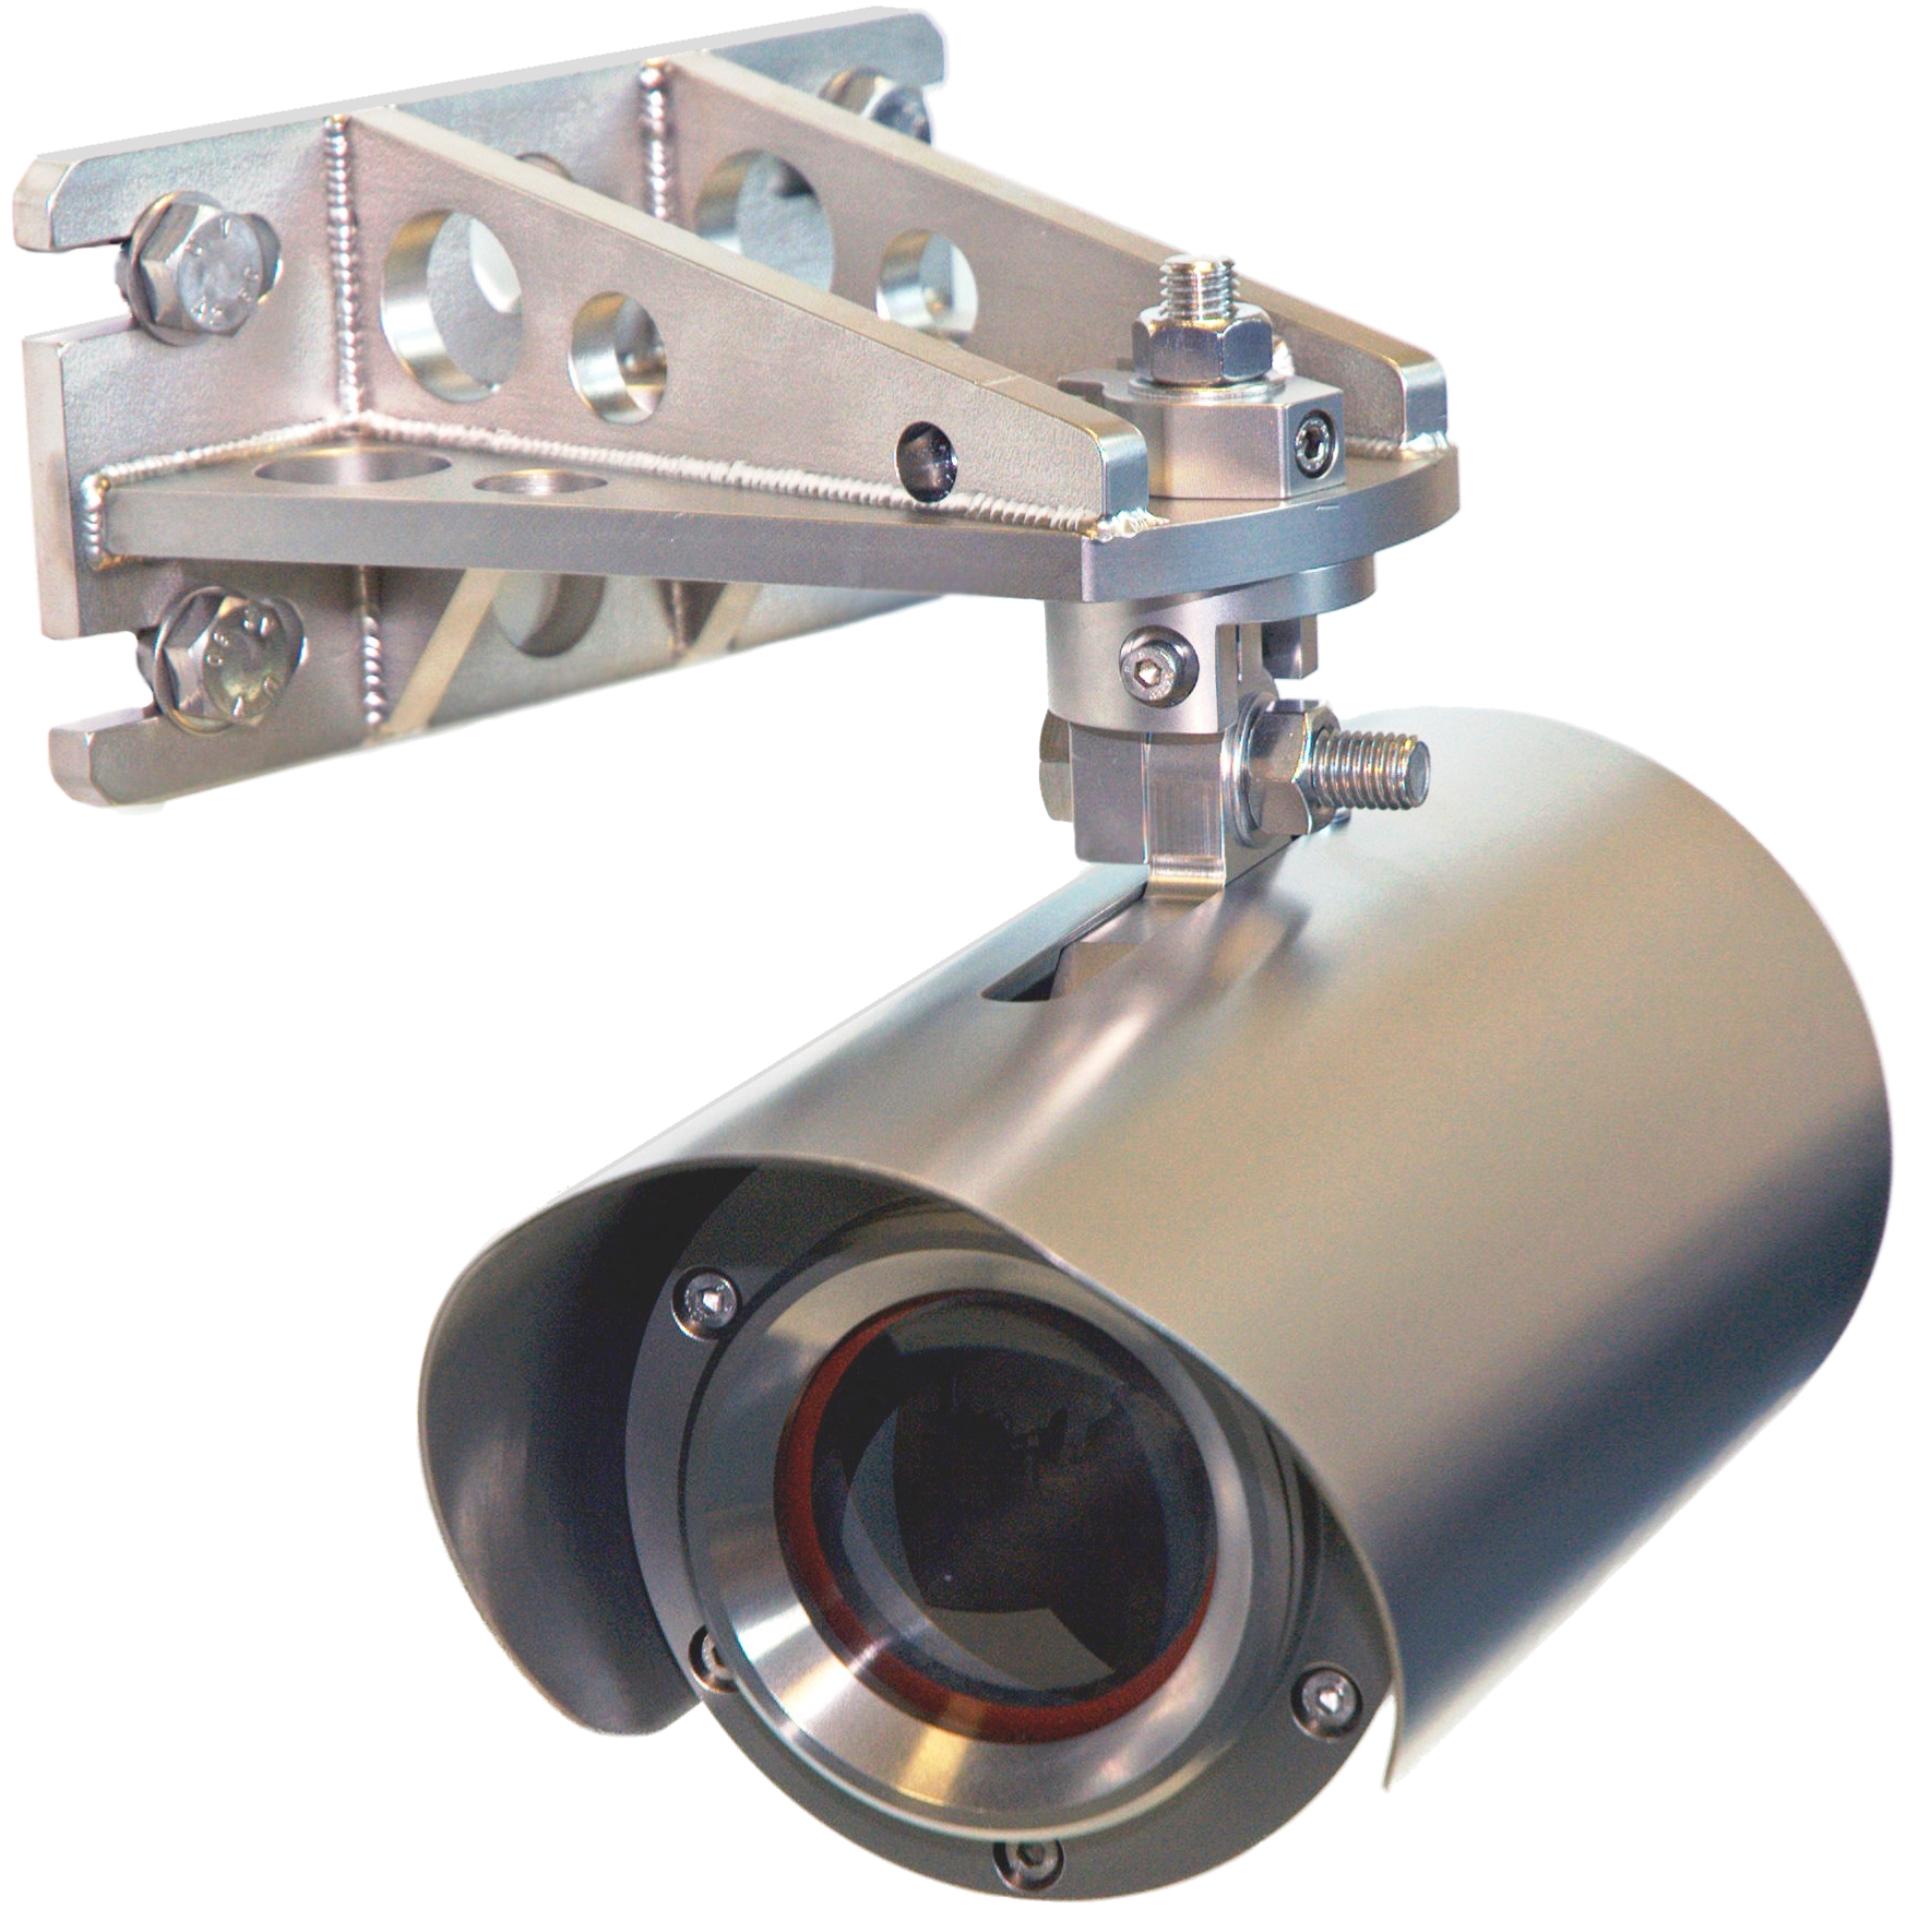 Senscient gass detektor gas detector Linje open path sensor Gasslekkasje leak gassmåler gassalarm ELDS MSA Norge forhandler